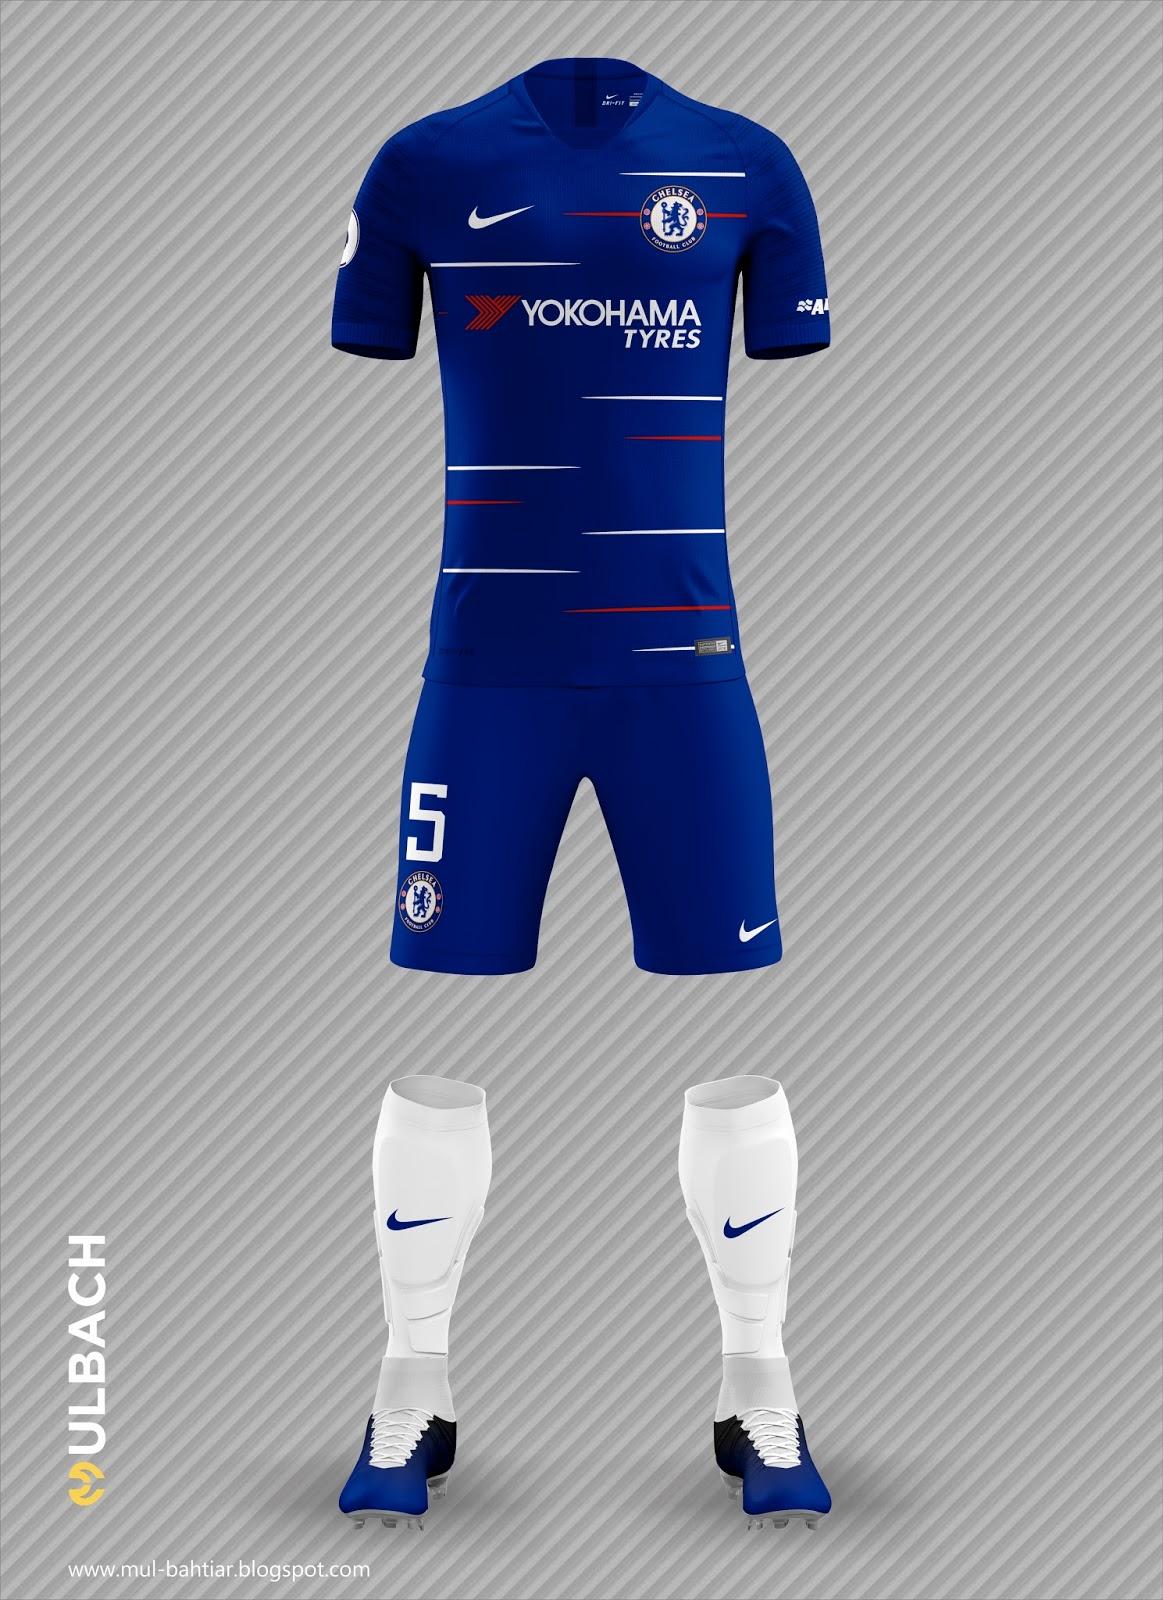 4de5aa08 New Chelsea 2019/20 Nike third kit: Leaked information .